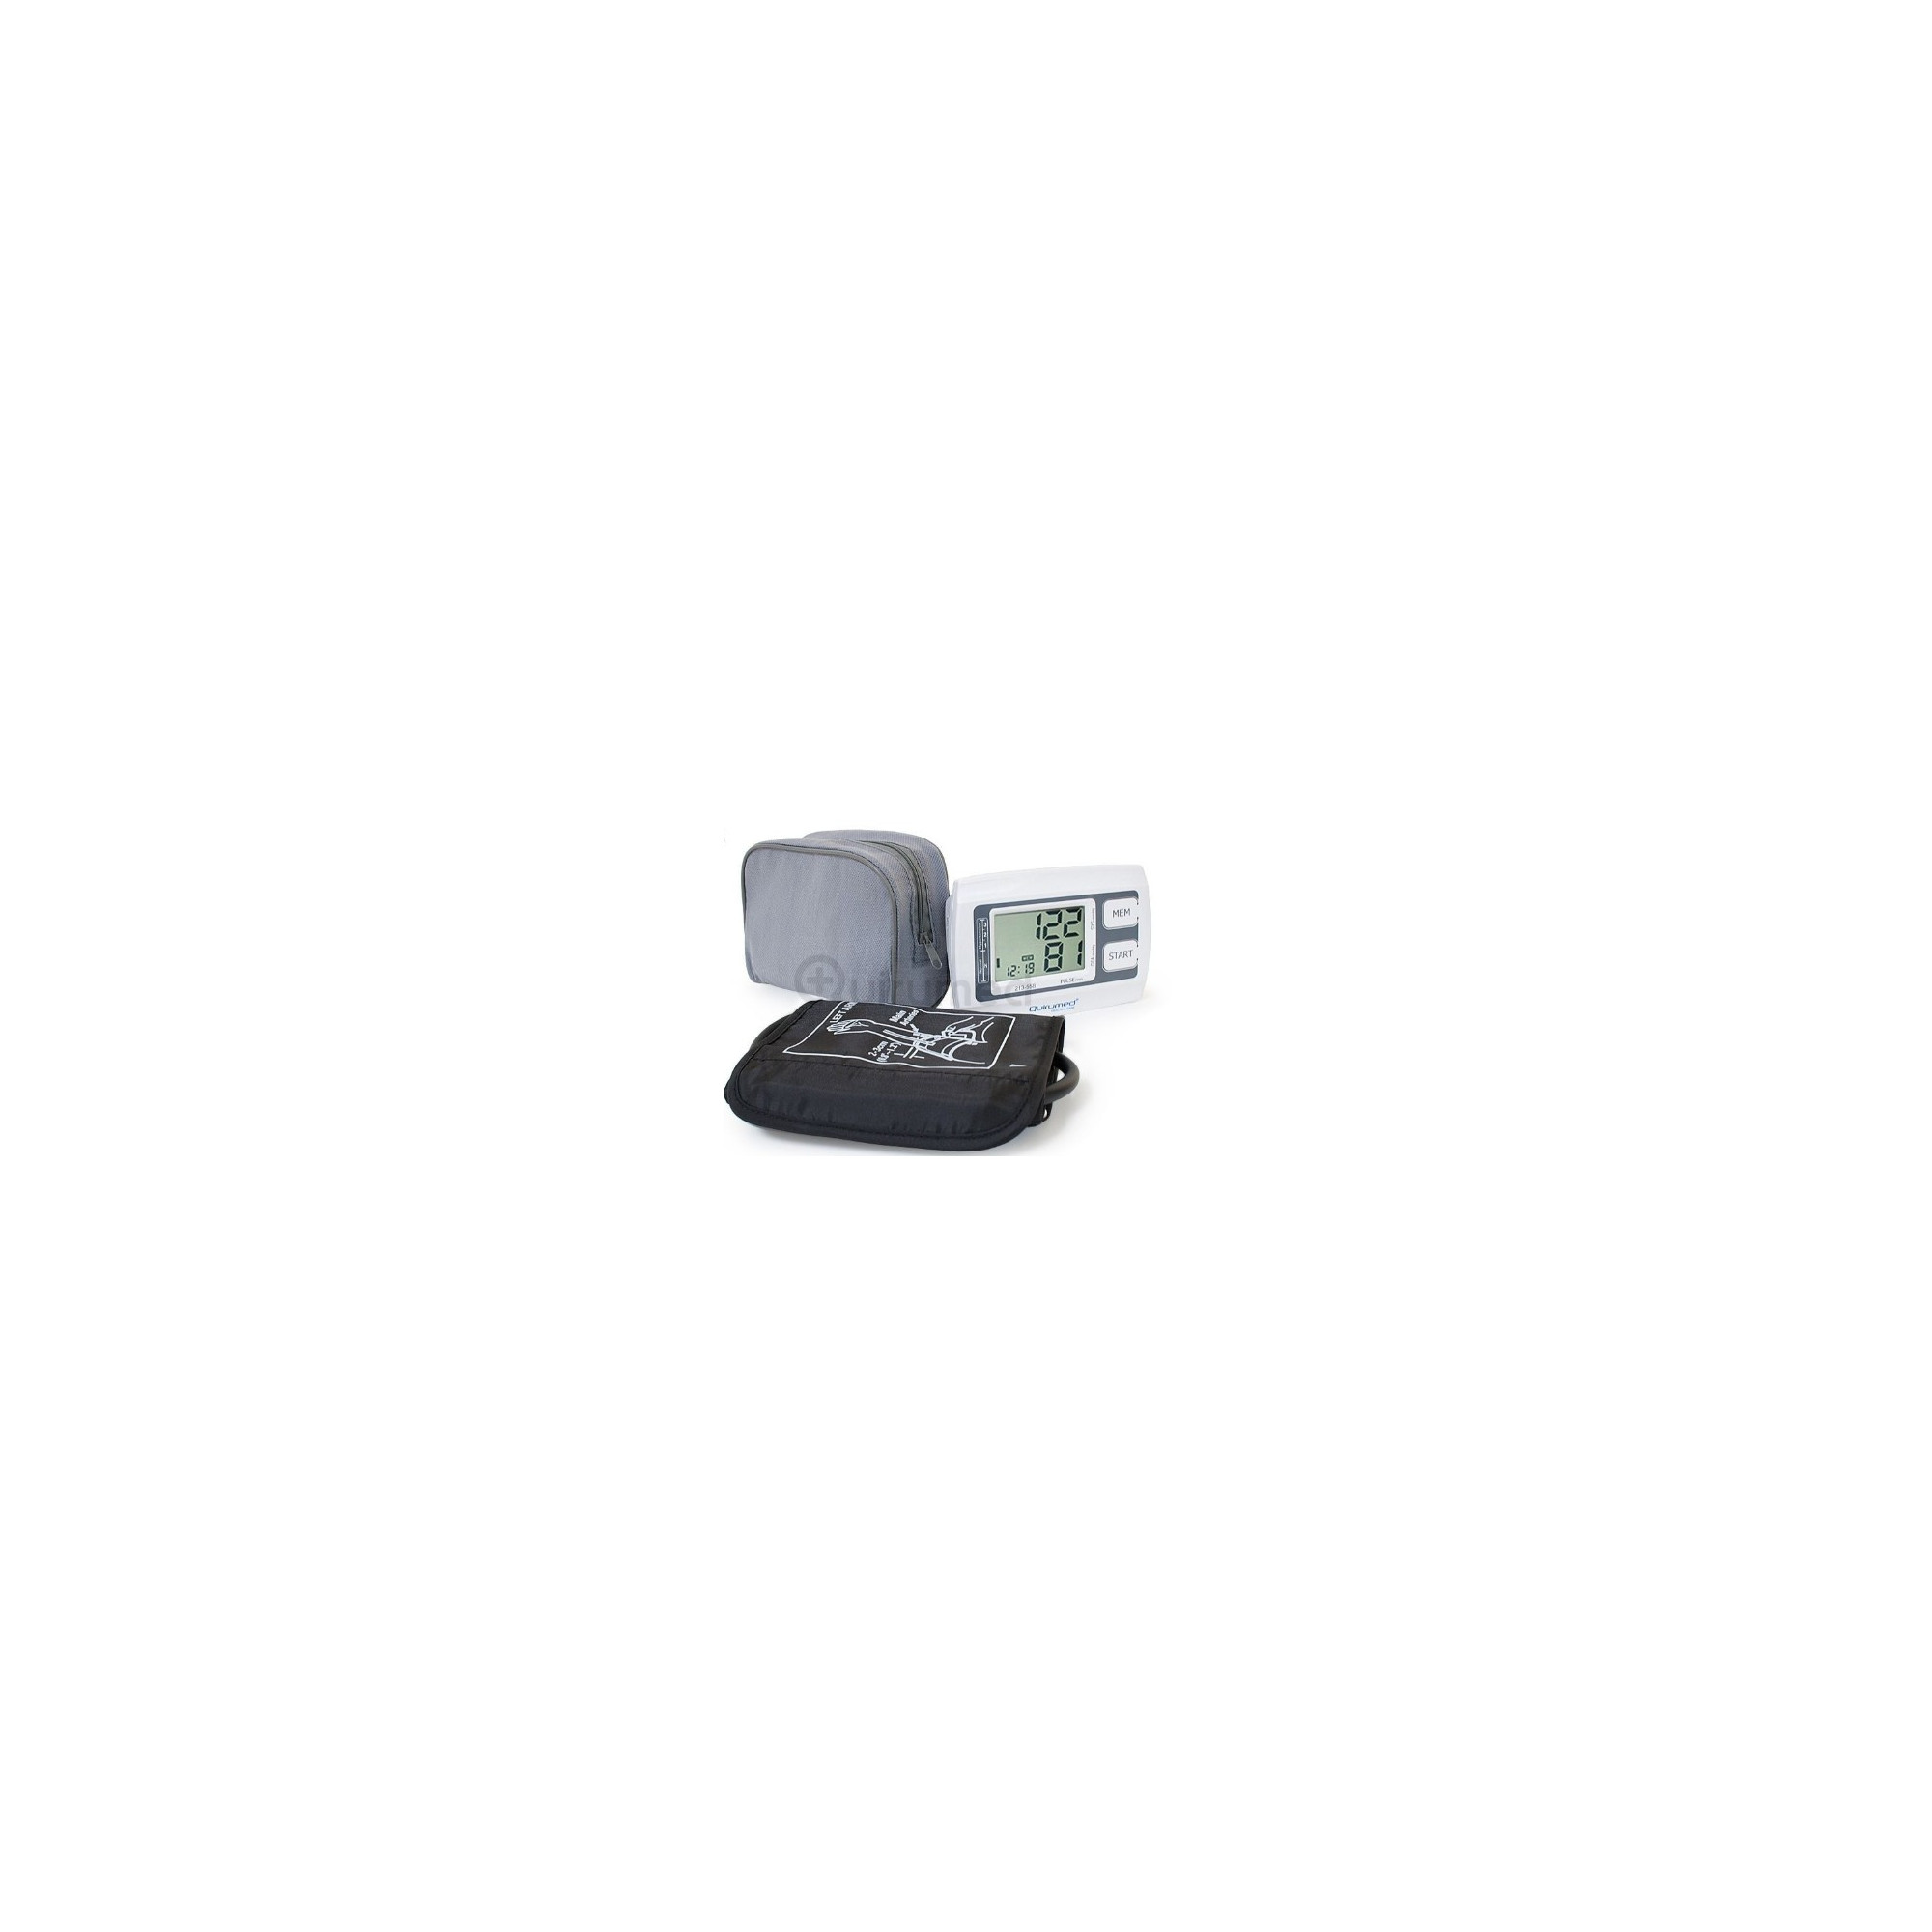 Tensiometro digital de mesa